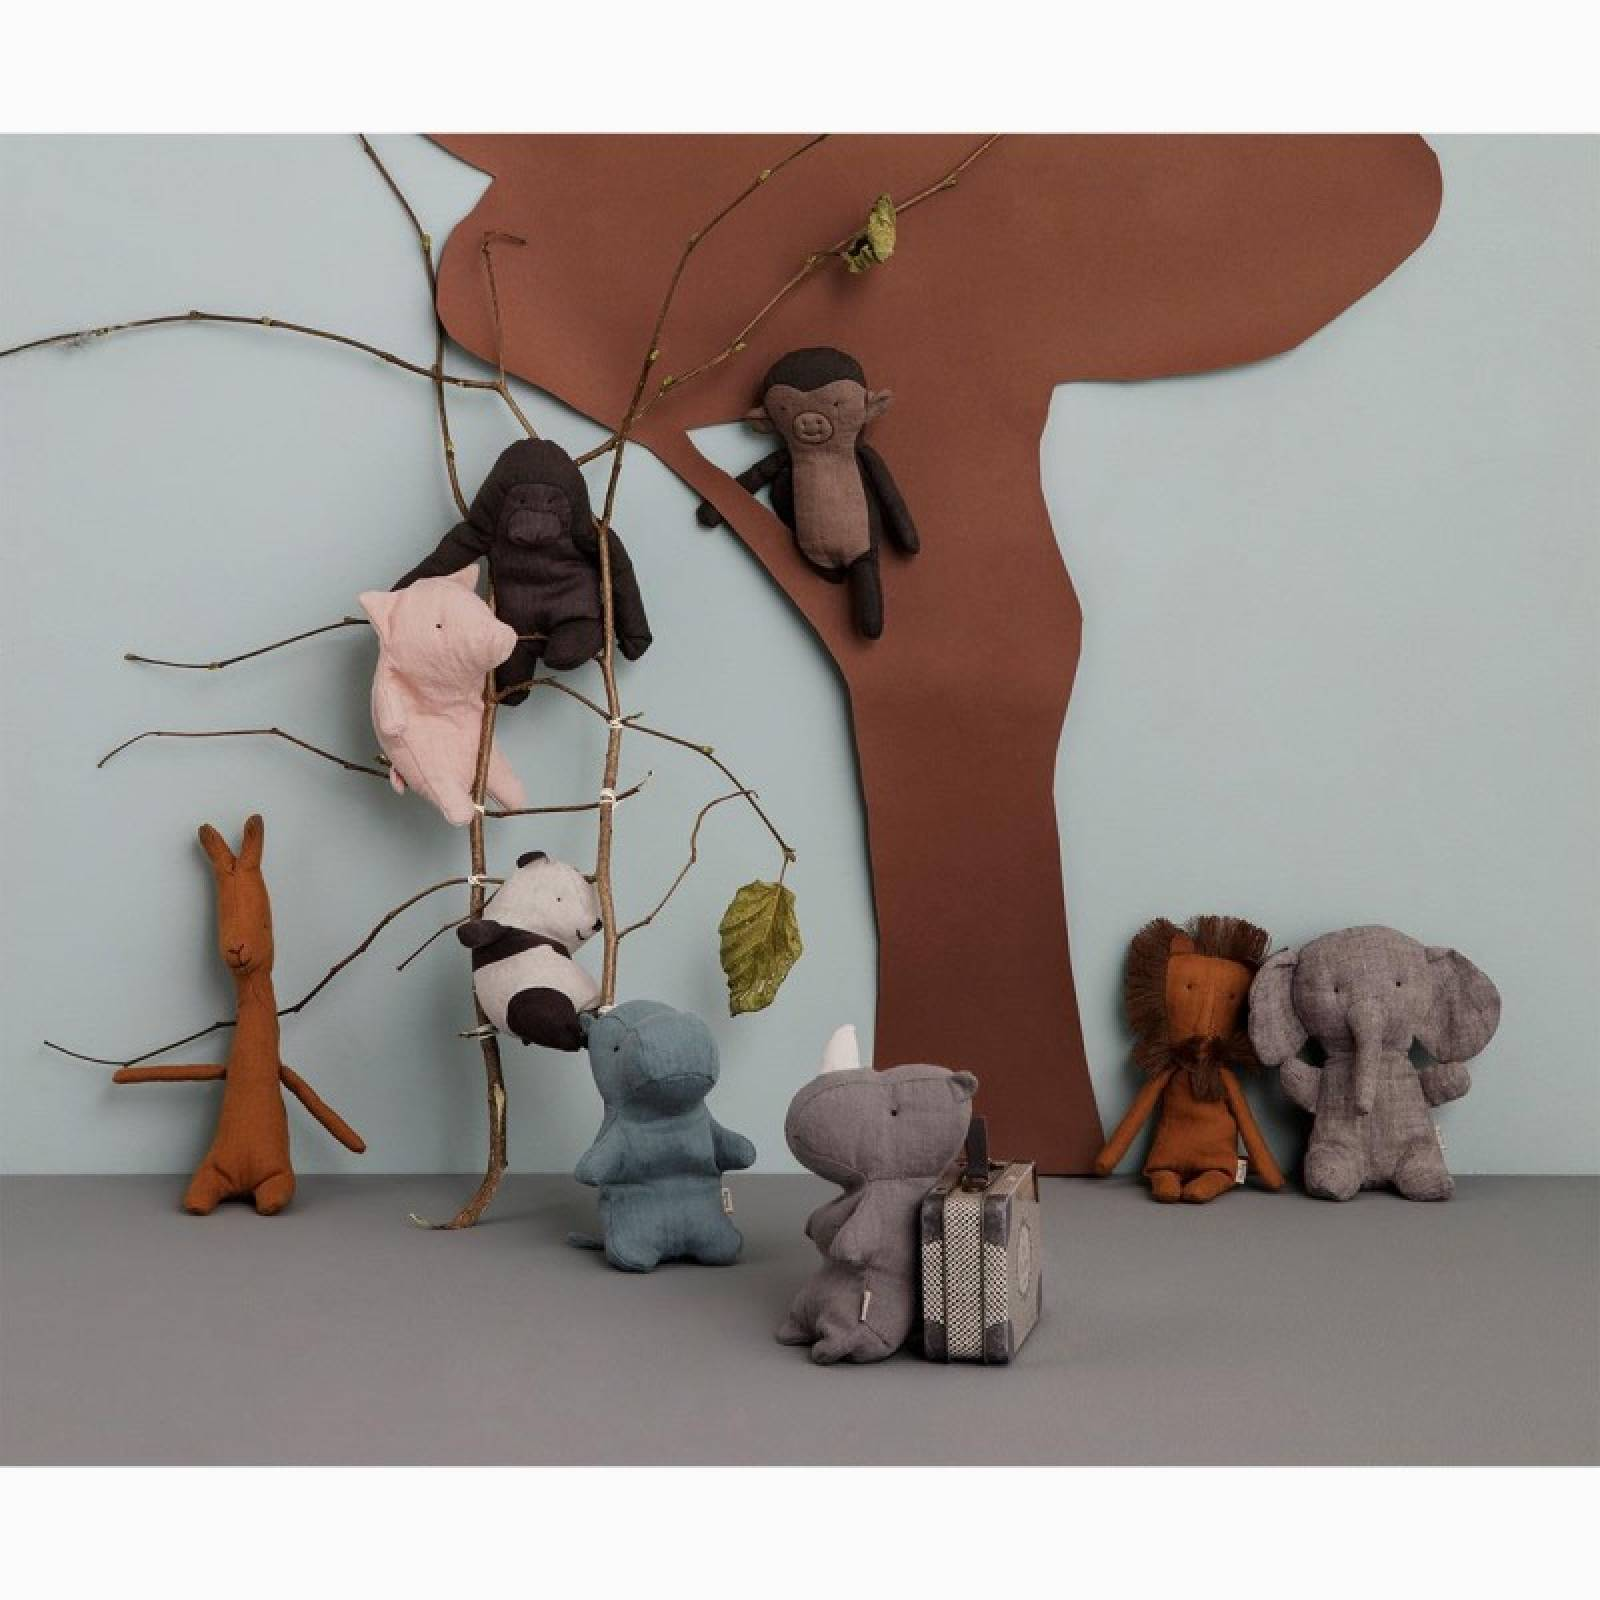 Mini Gorilla Soft Toy Noah's Friends By Maileg 0+ thumbnails